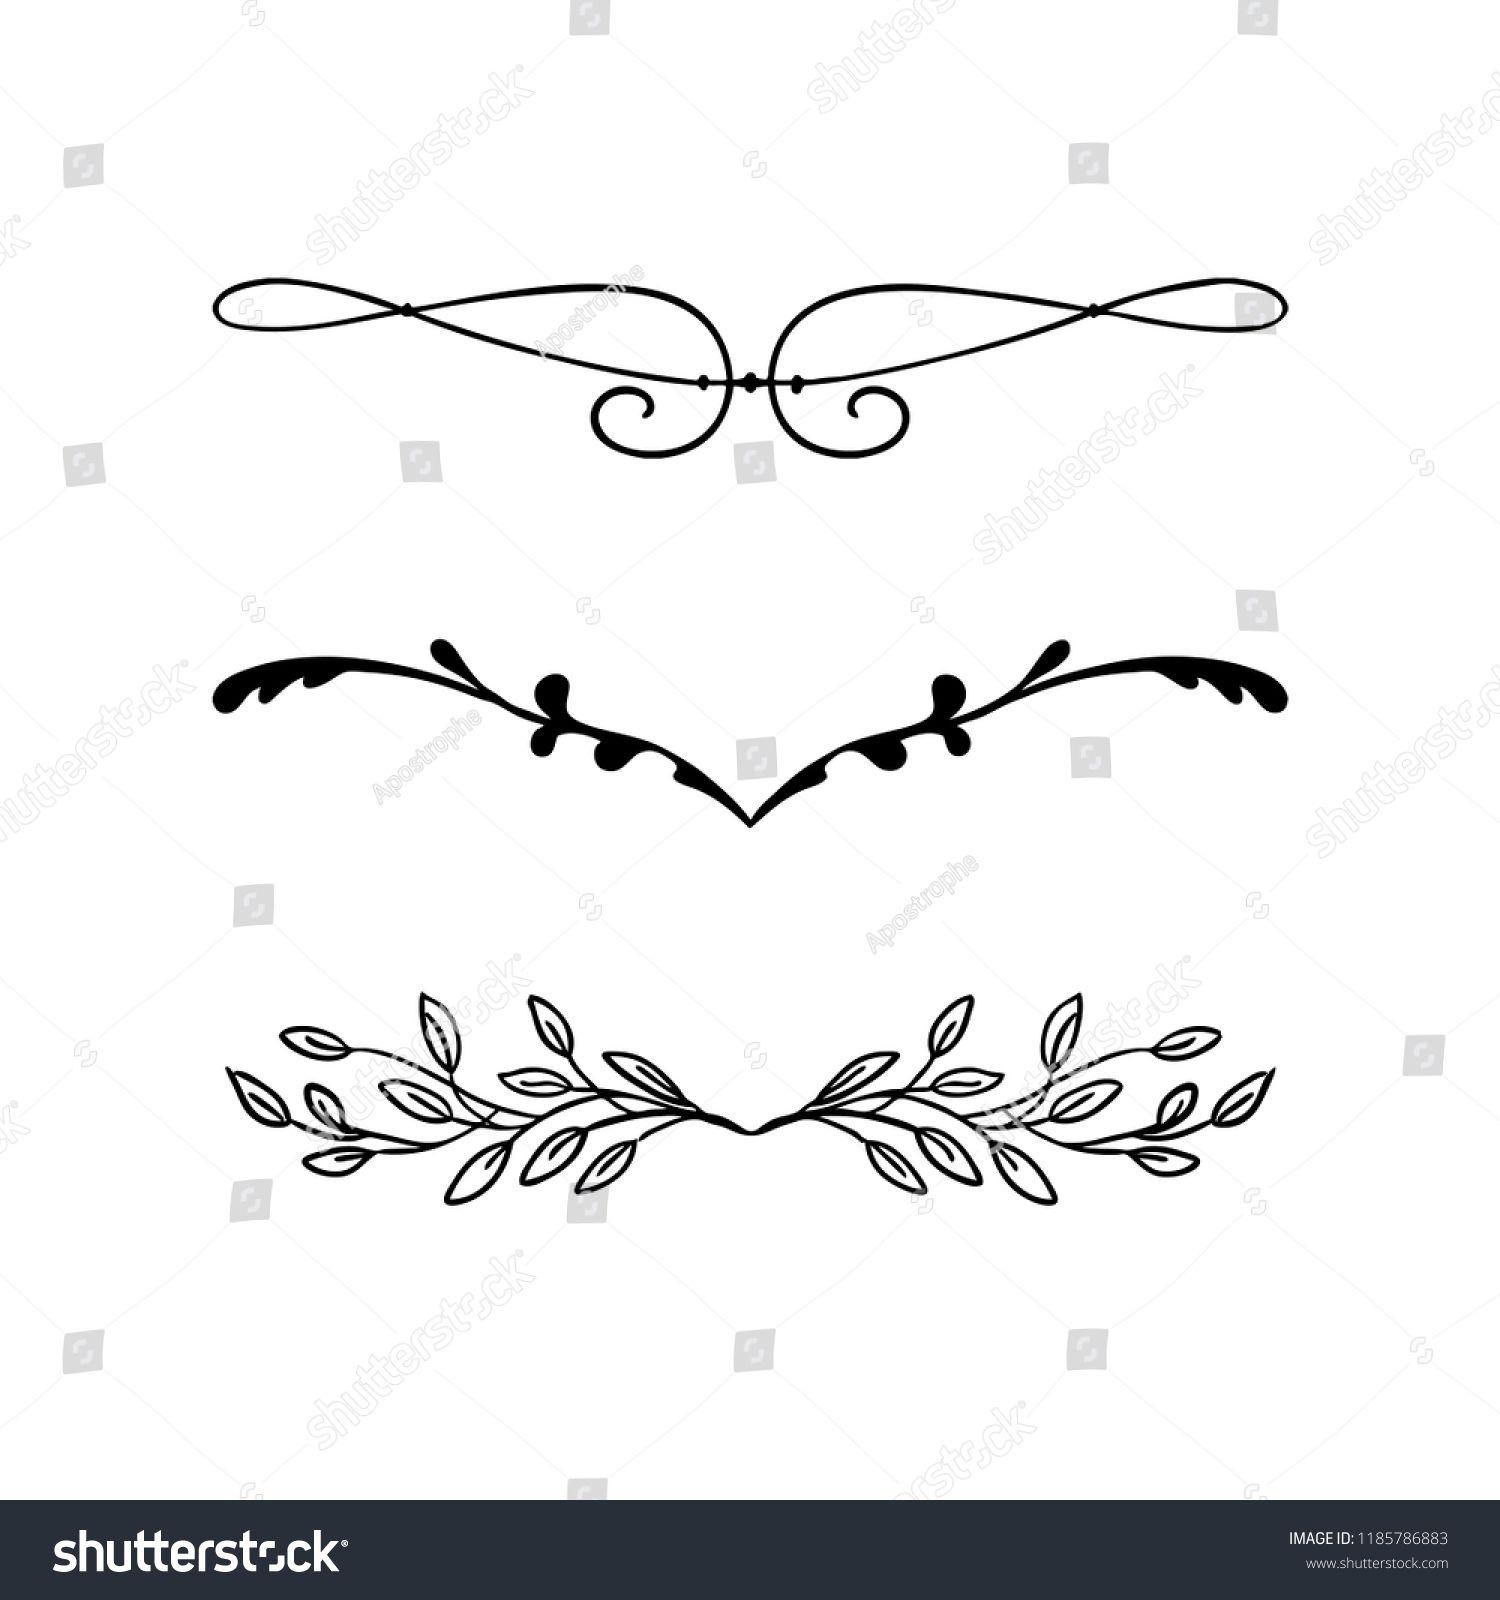 Design Element Vector Beautiful Fancy Curls And Swirls Divider Or Underline Design With Ivy Vines And Leaves In Black Design Element Chalkboard Designs Design